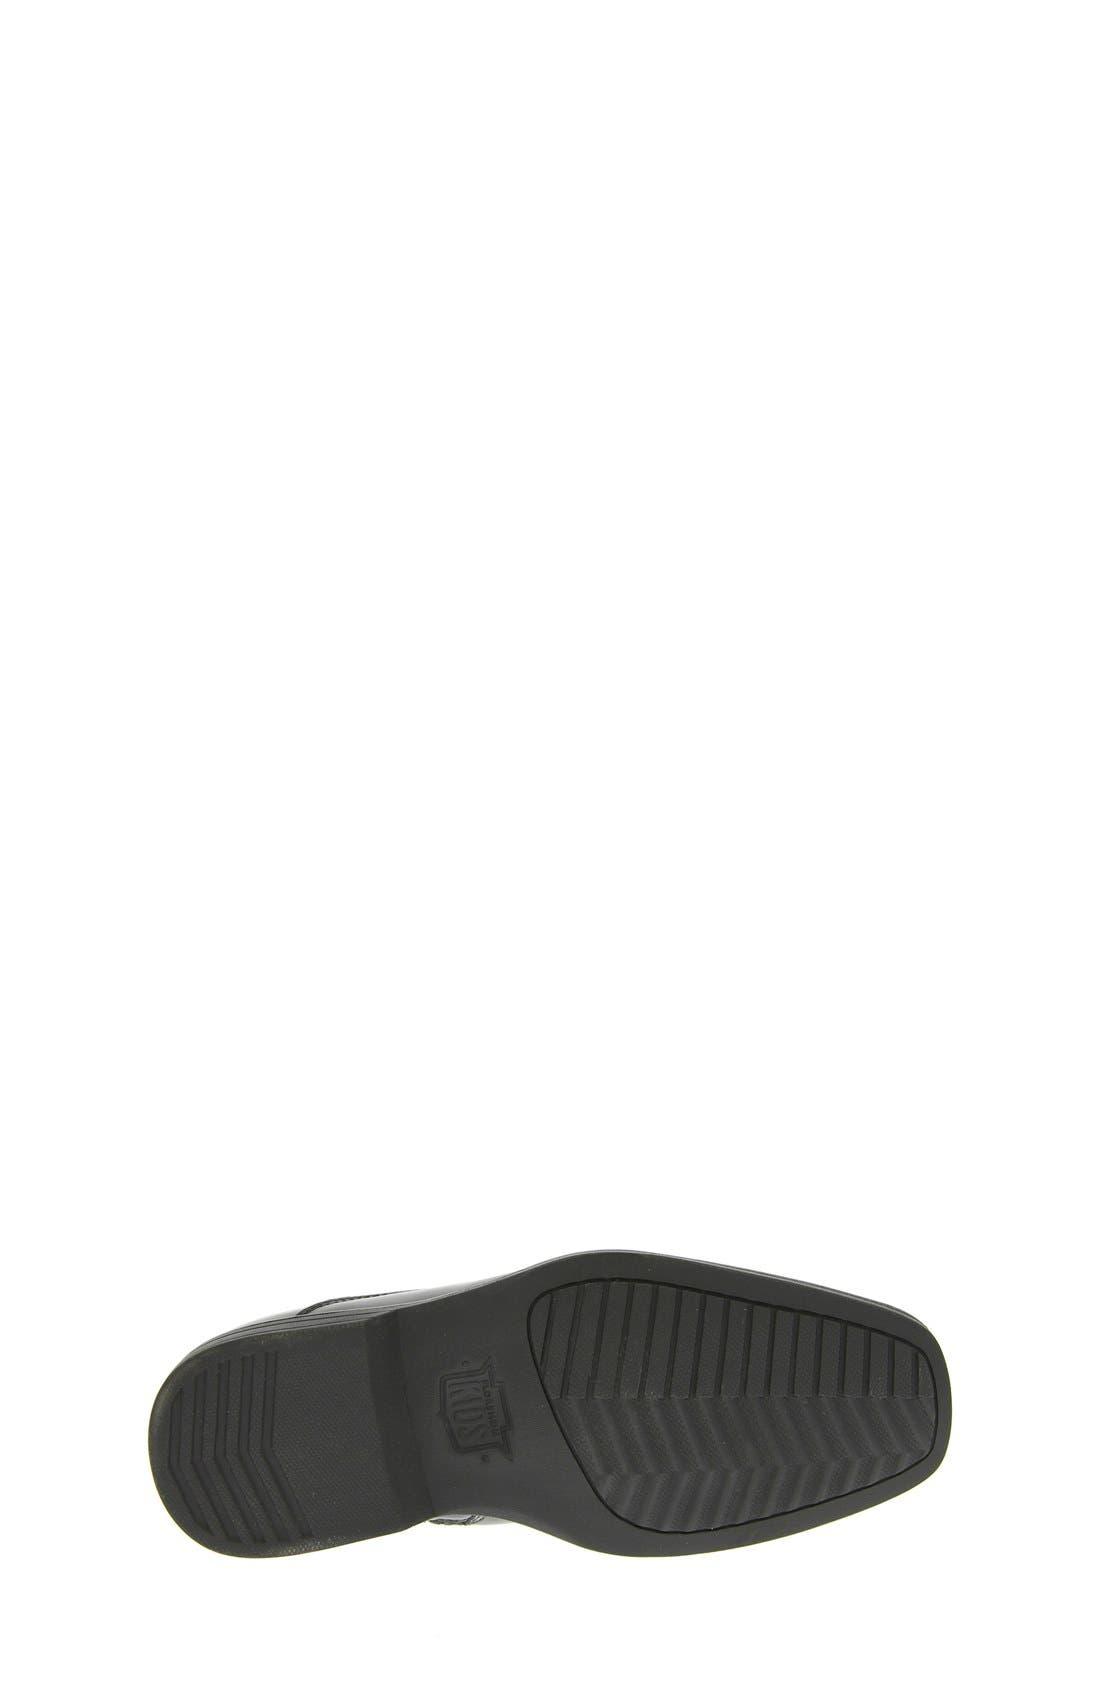 Alternate Image 4  - Florsheim Chelsea Boot (Toddler, Little Kid & Big Kid)